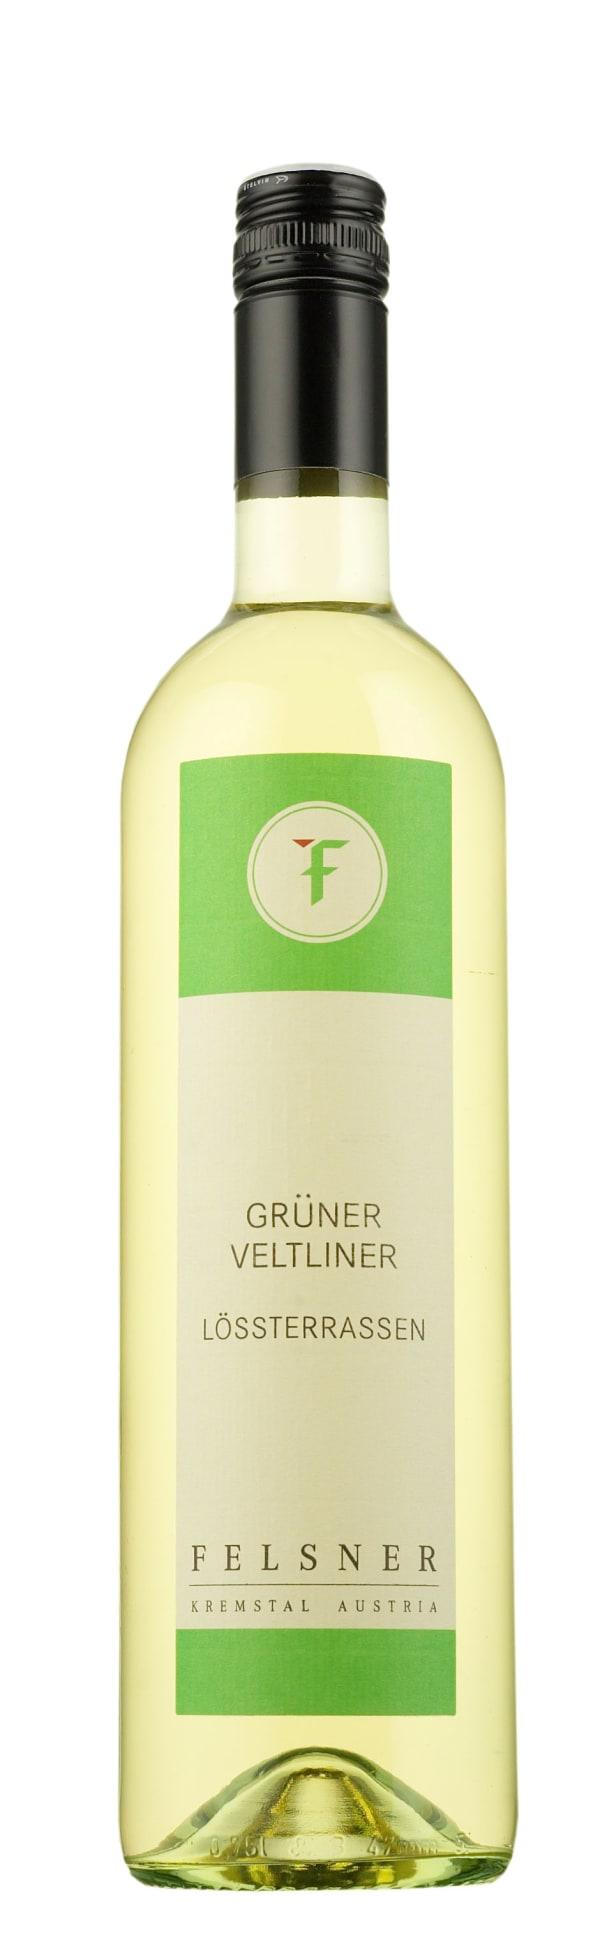 Felsner Lössterrassen Grüner Veltliner 2018